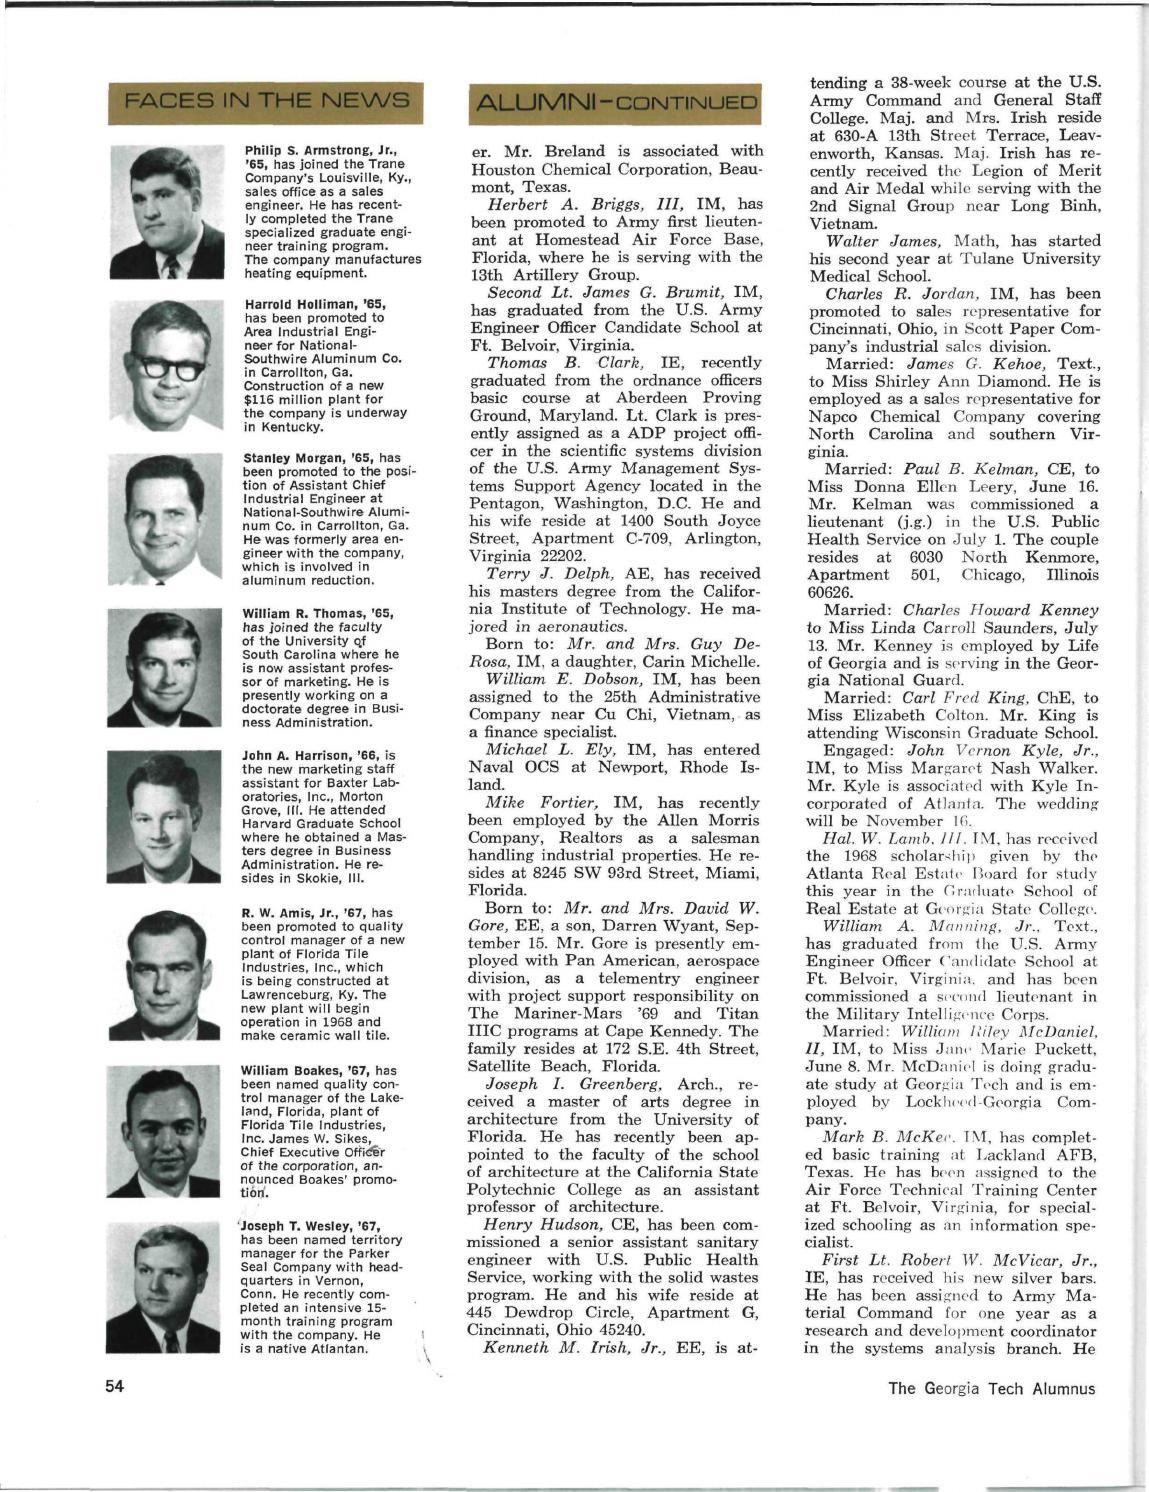 georgia tech alumni magazine vol 47